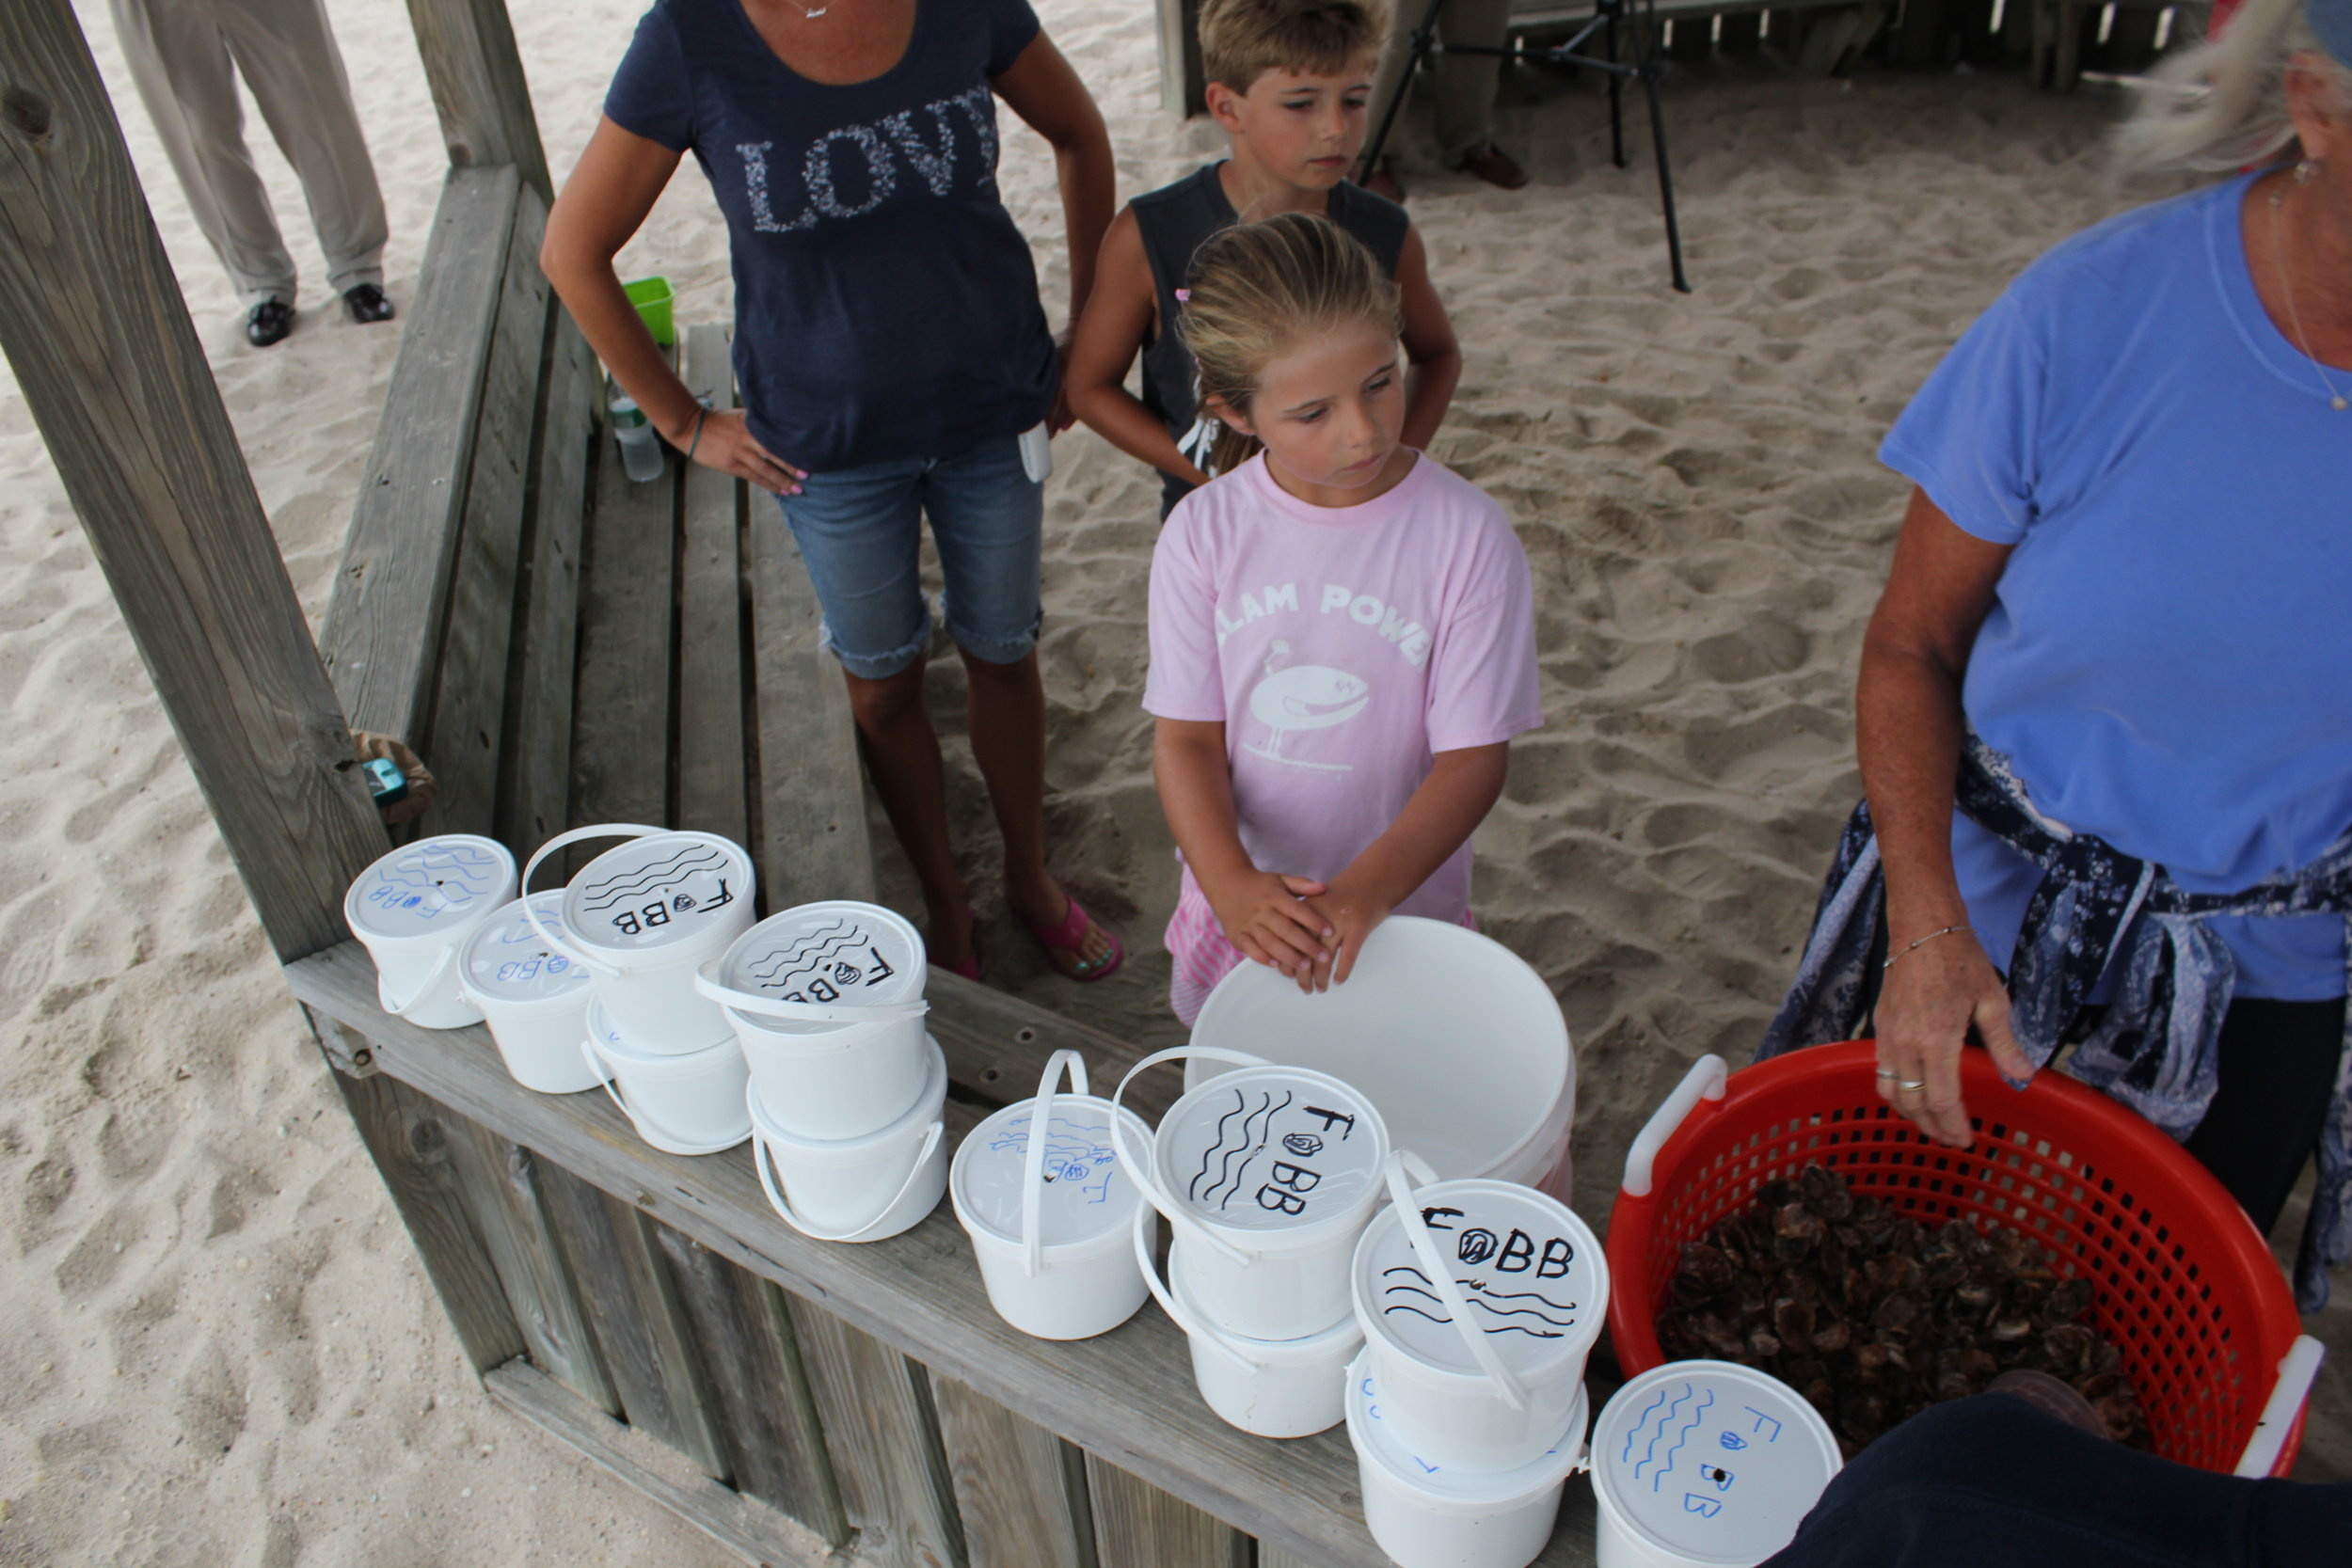 Frst Plnt Ltl Girl Oyster Buckets at Dock.JPG